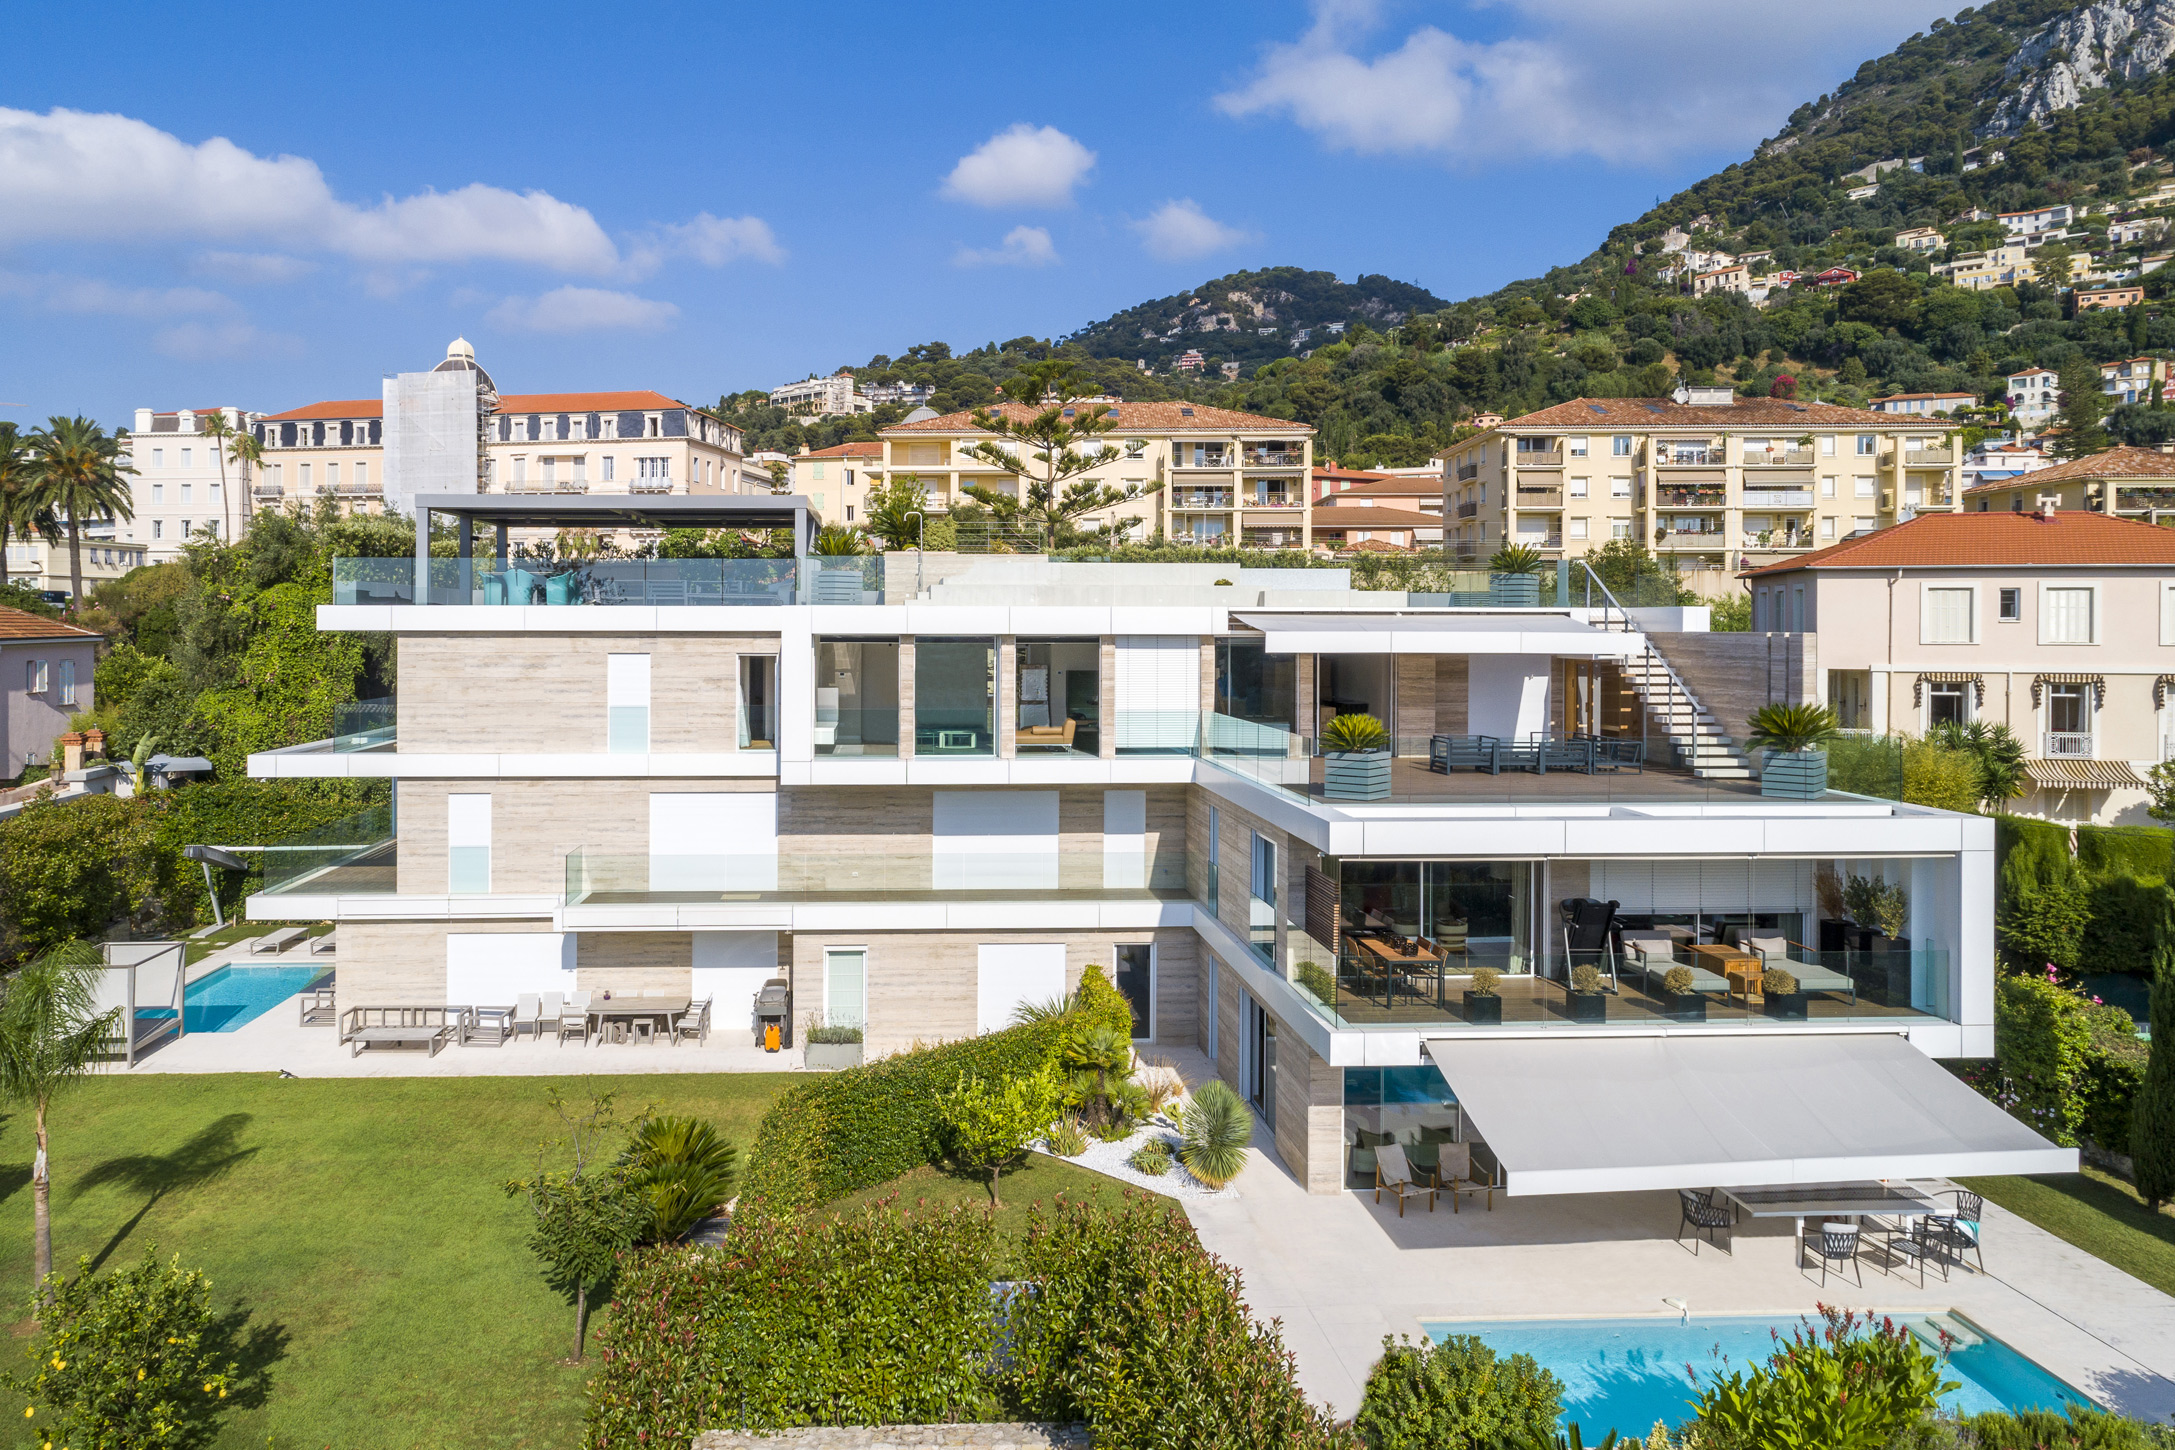 matteo-gennari-architecte-residence-la-tonnelle